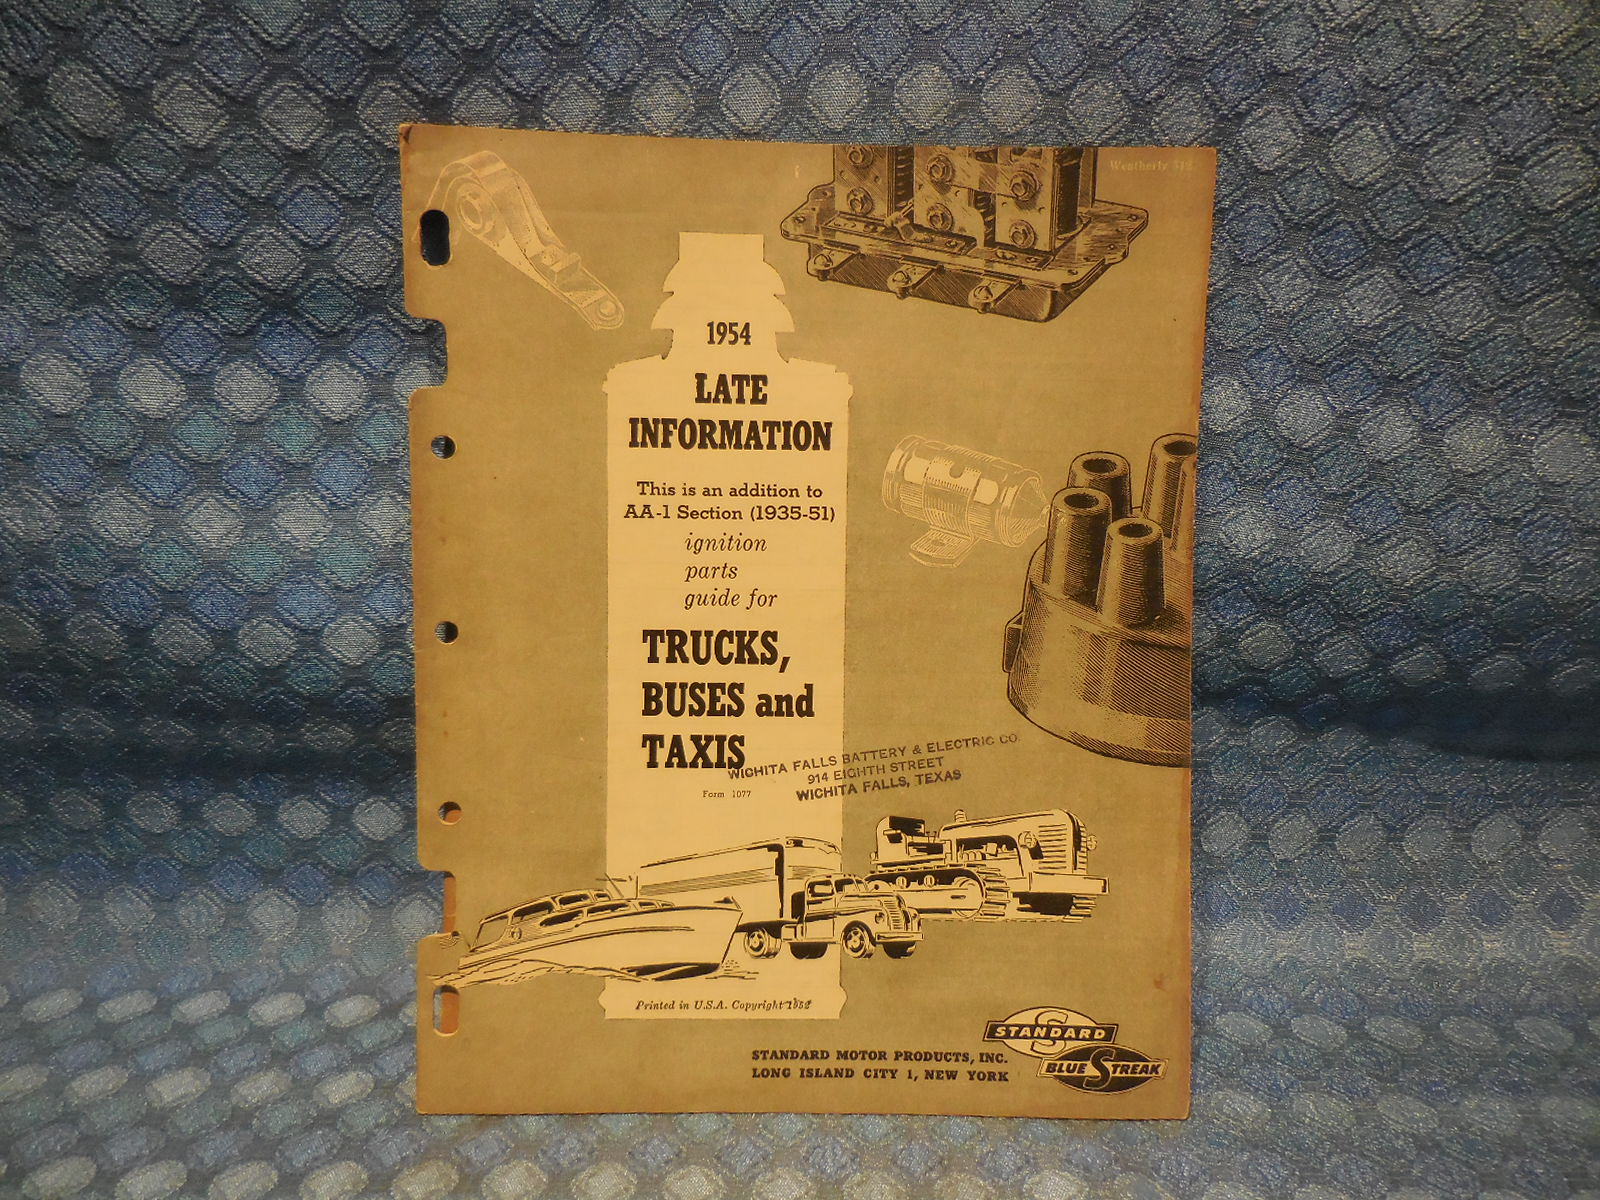 1951-1954 Blue Streak Original Truck Ignition Parts Catalog GMC Ford IHC  Mack Reo – NOS Texas Parts, LLC – Antique Auto PartsNOS Texas Parts, LLC